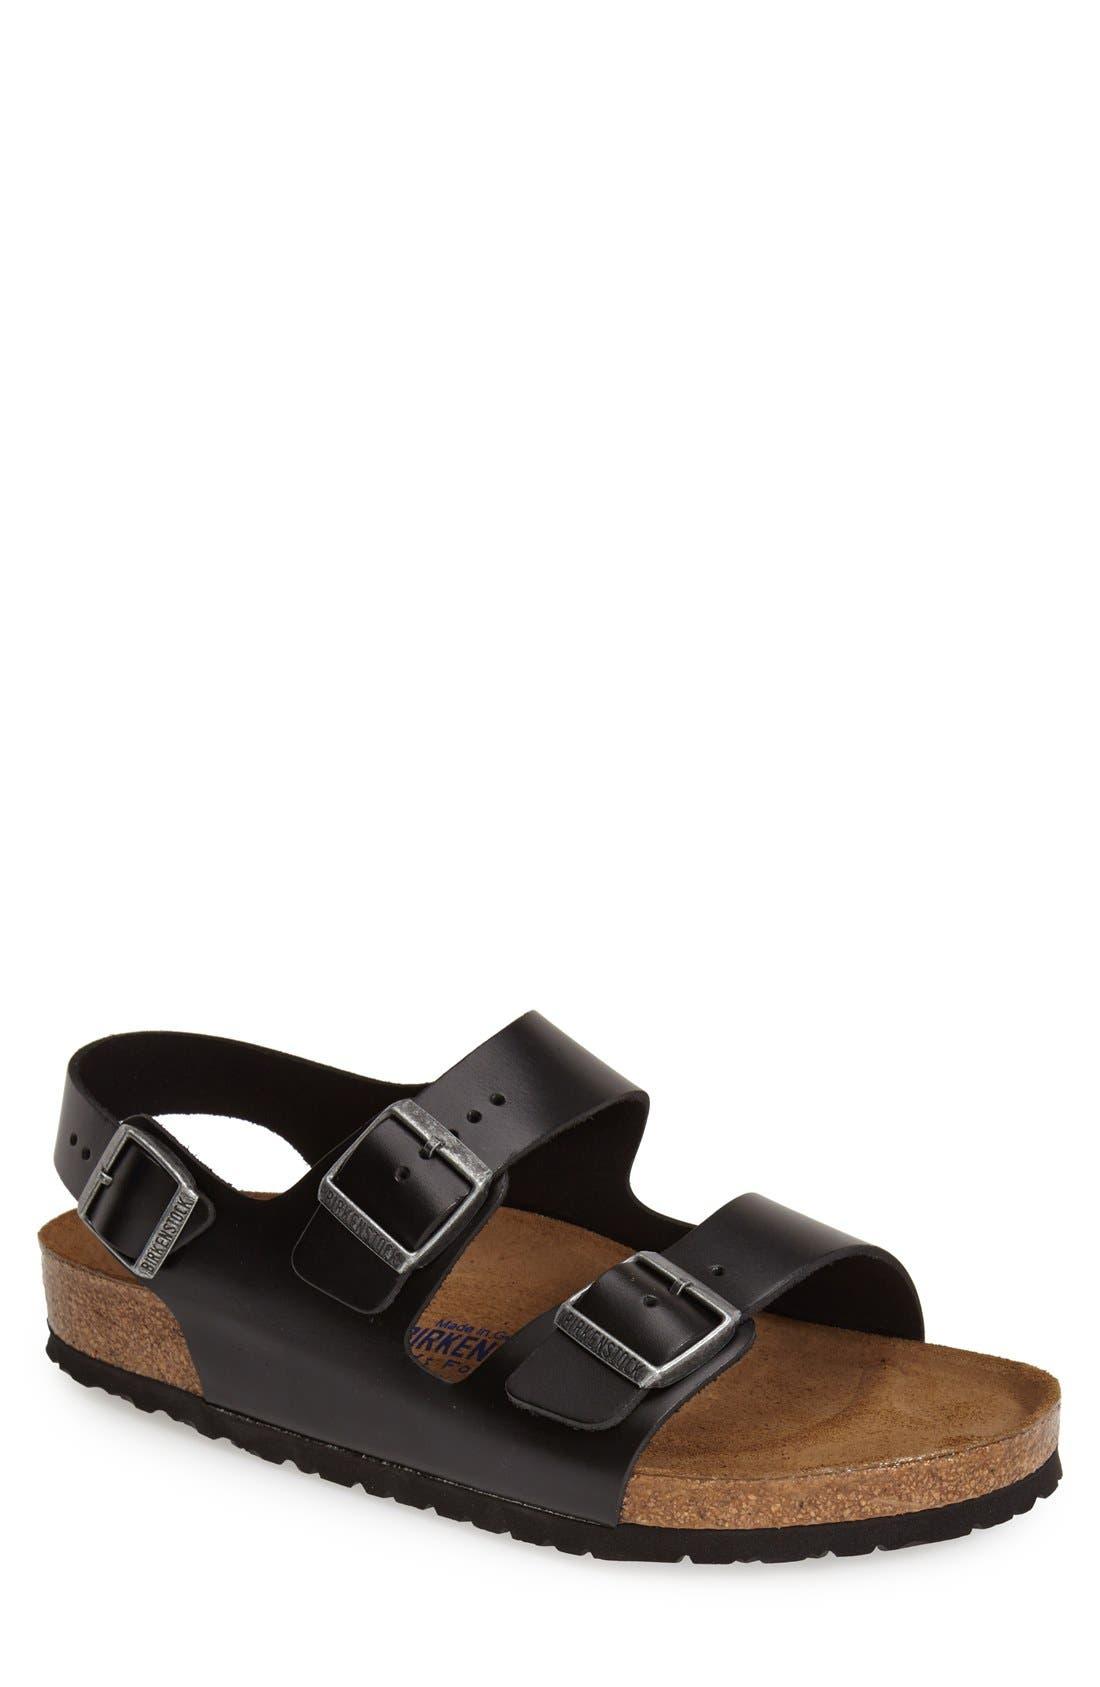 'Milano' Soft Footbed Sandal,                             Main thumbnail 1, color,                             AMALFI BLACK